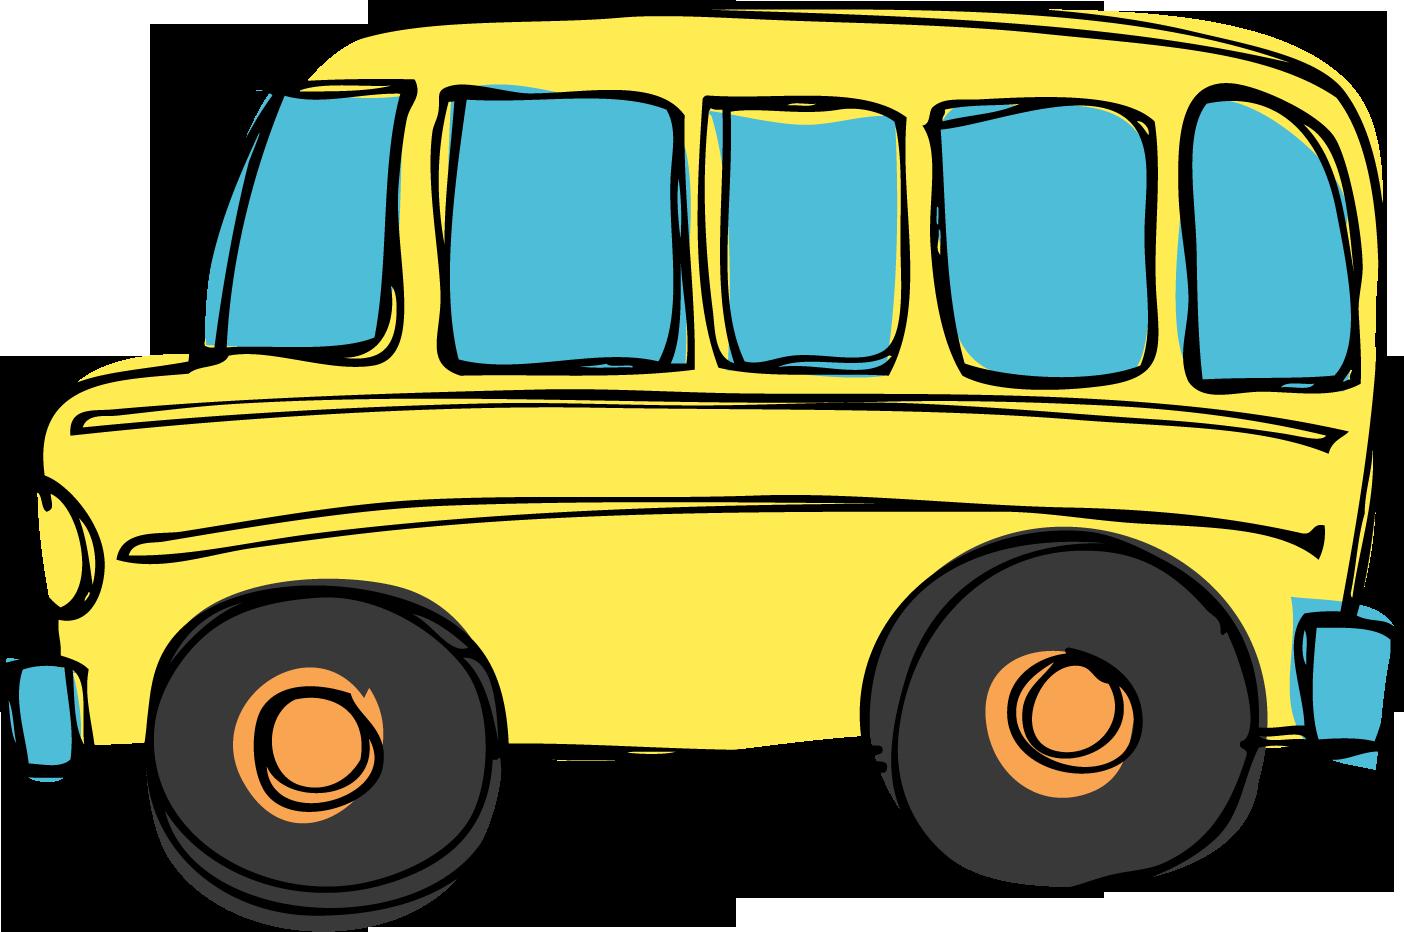 School bus border clip art free clipart images.